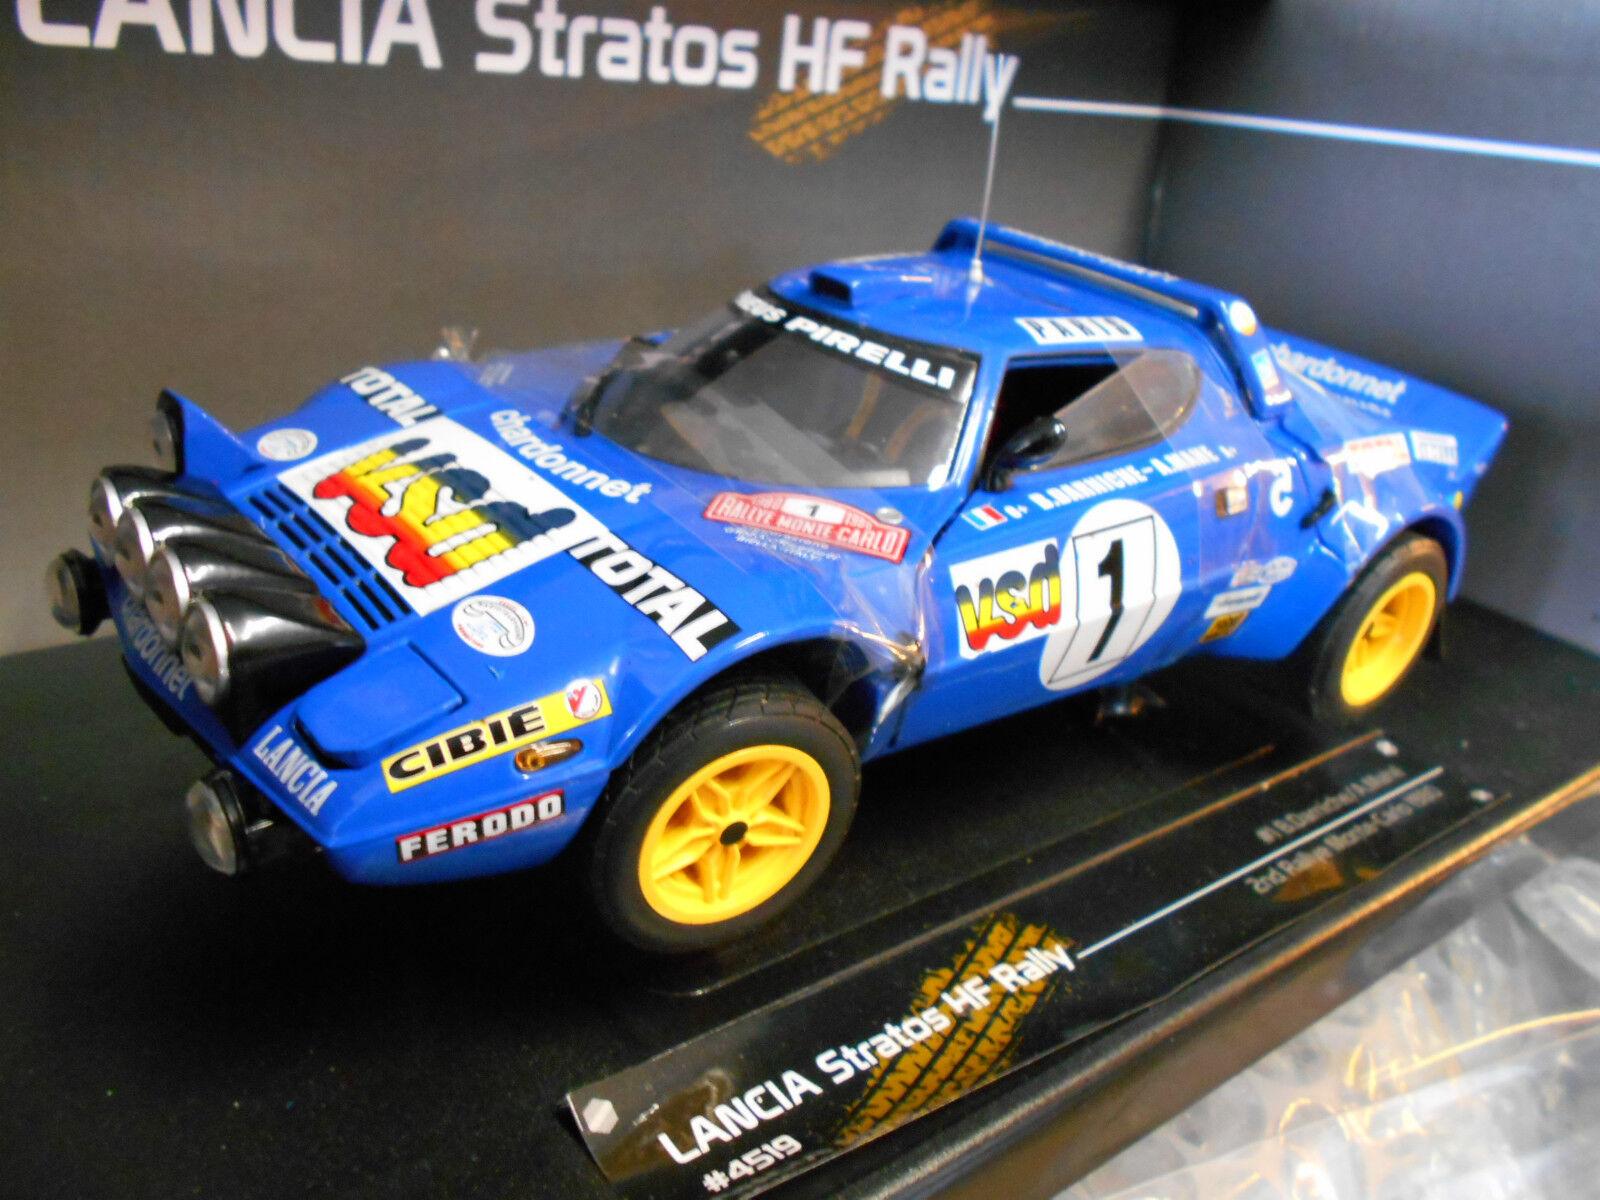 más orden Lancia Stratos Stratos Stratos HF Rally de Monte Cochelo 1980 Darniche  1 2. place SunEstrella nuevo 1 18  mejor moda